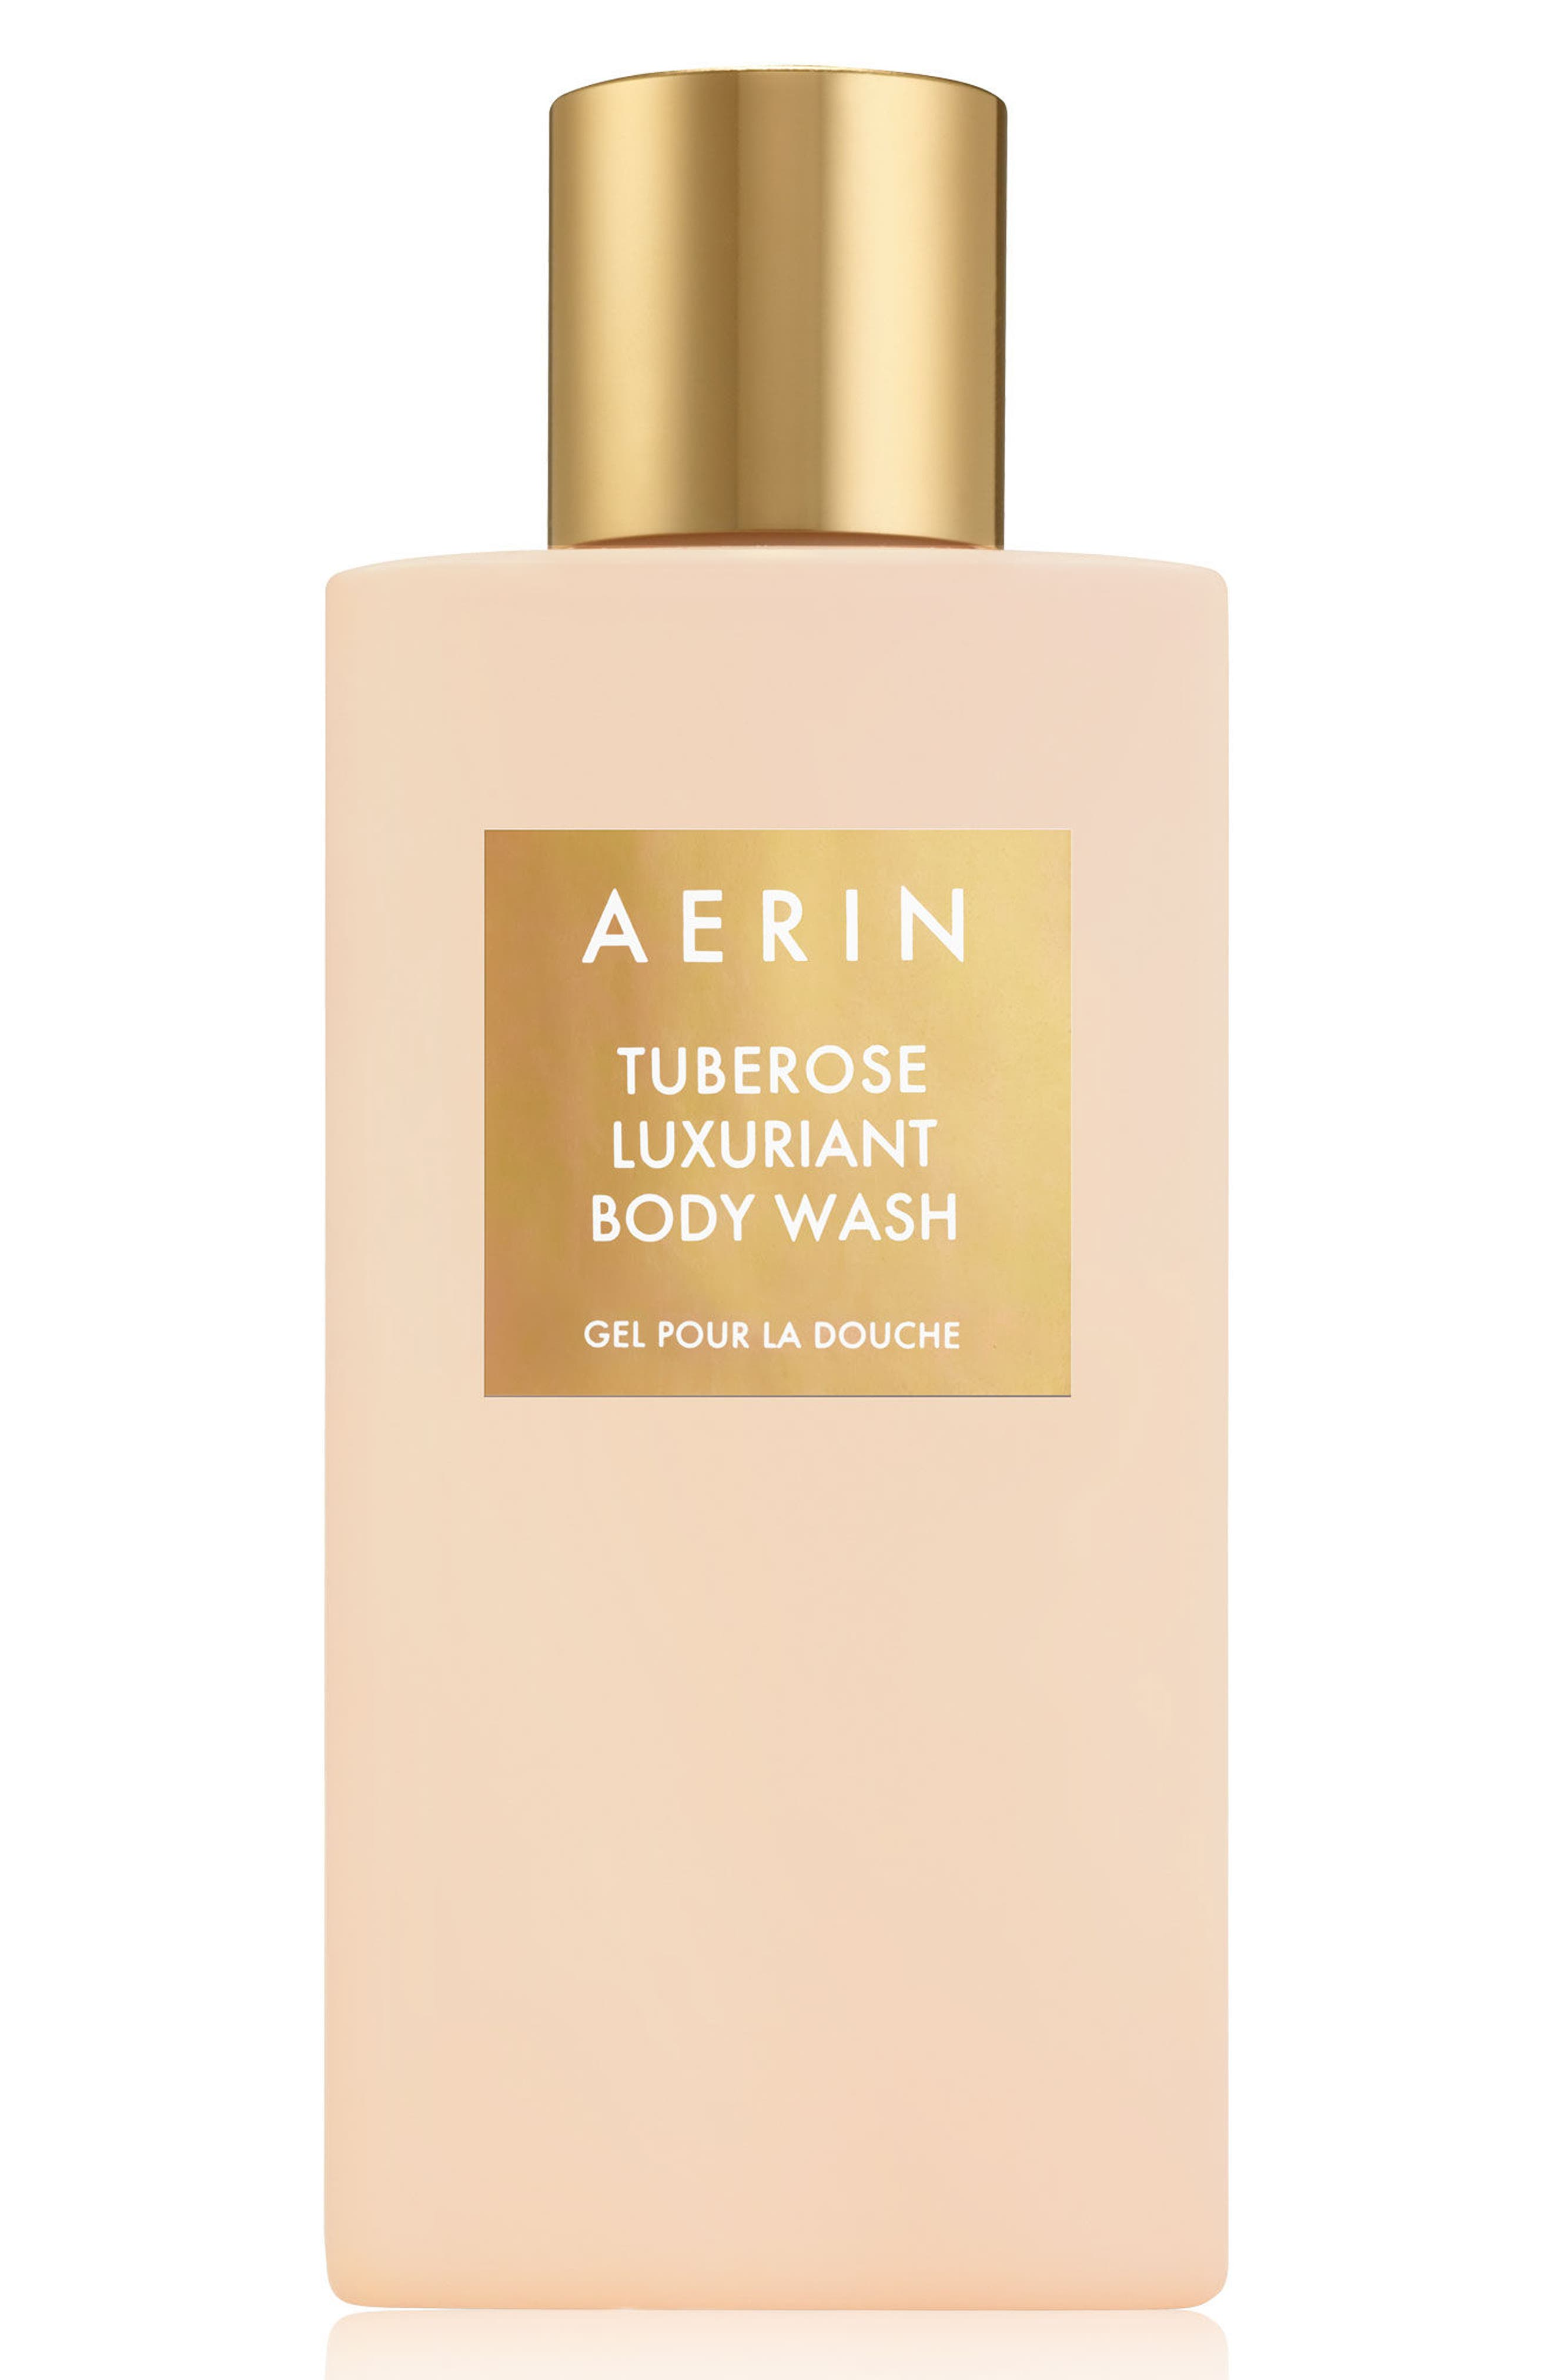 AERIN Beauty Tuberose Luxuriant Body Wash